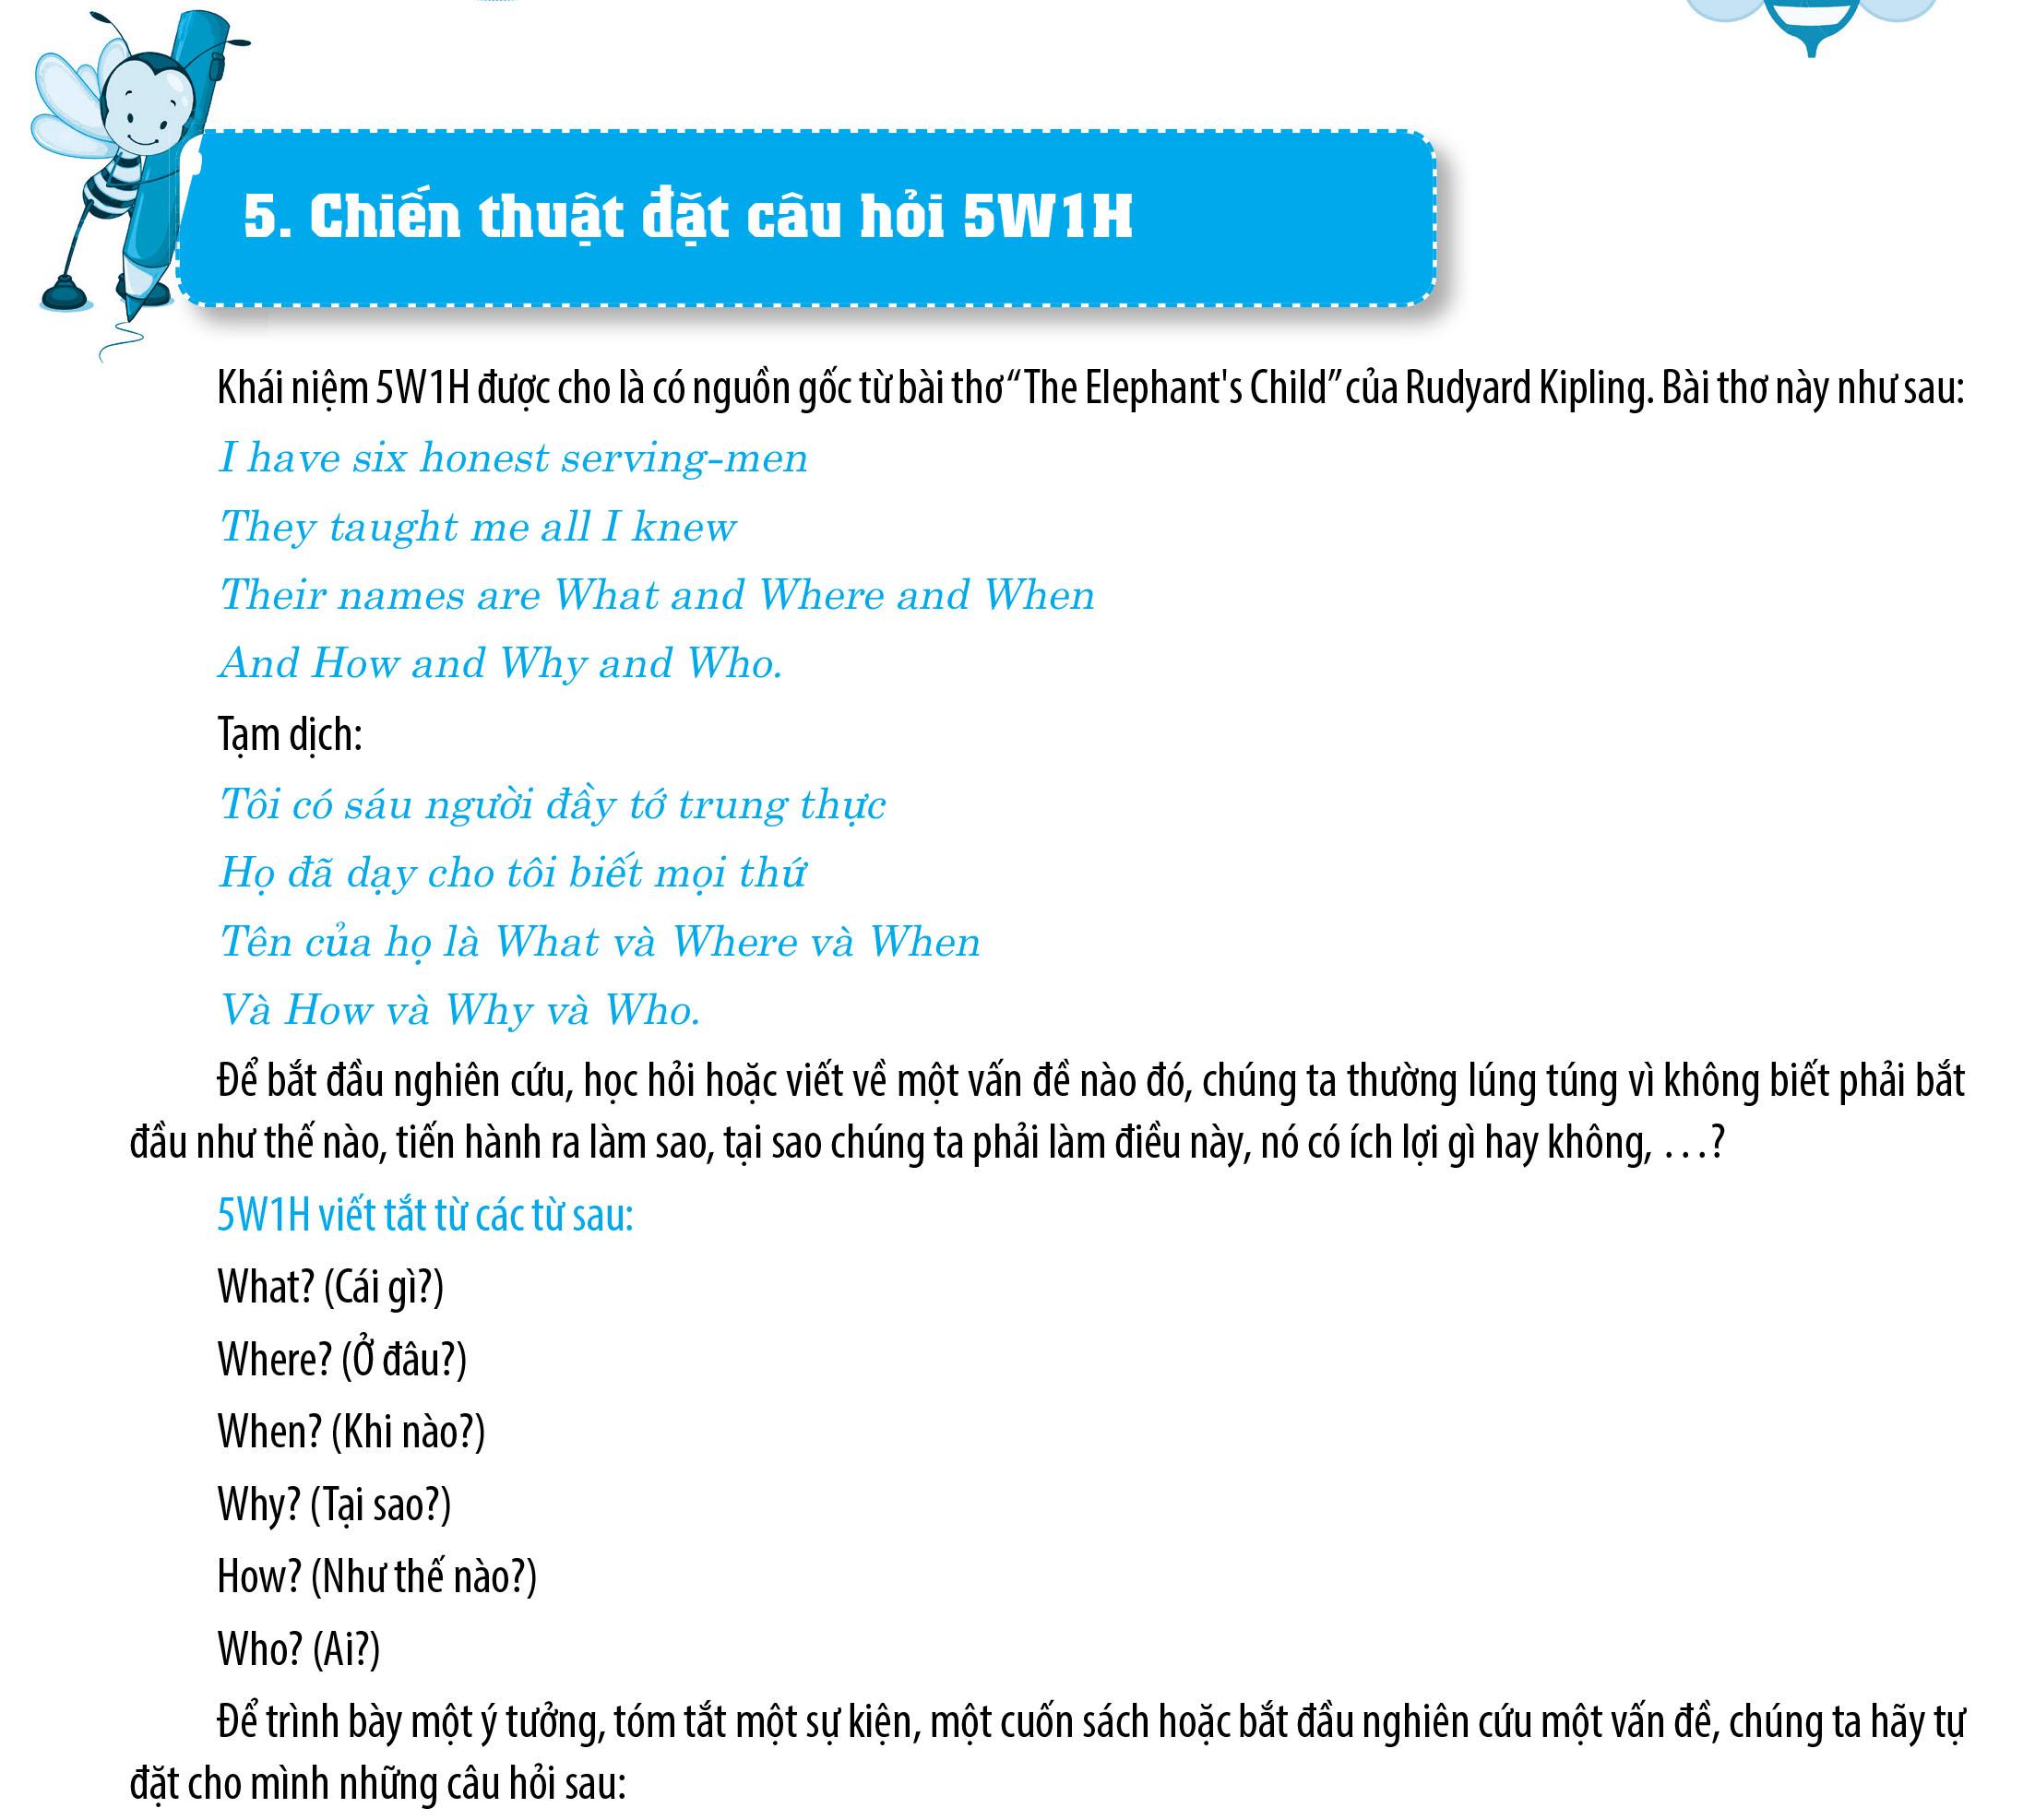 SACH NGHI LUAN VAN HOC 25102016.indd